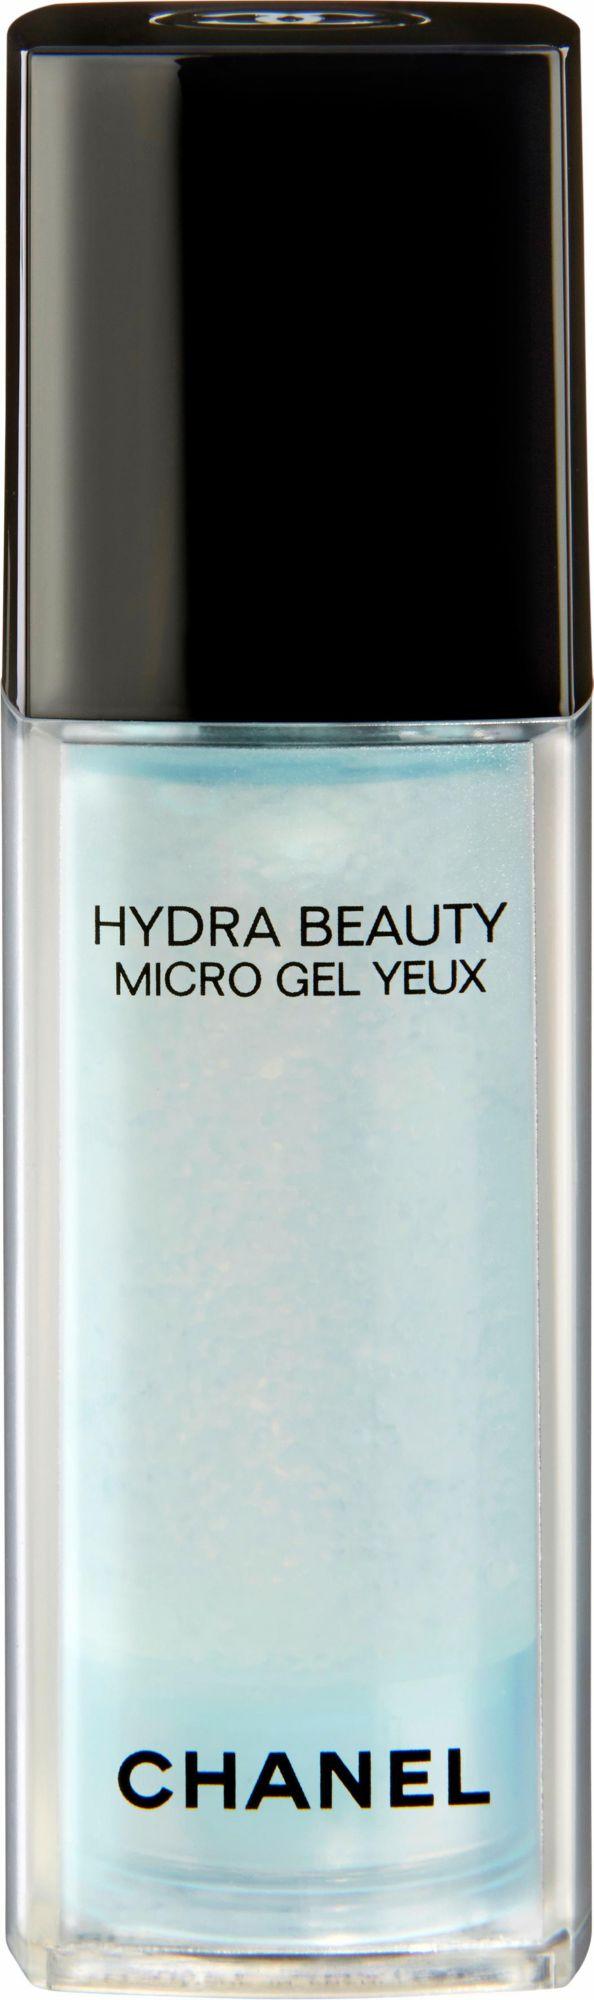 CHANEL Chanel, »Hydra Beauty Micro Gel Yeux«, Augengel